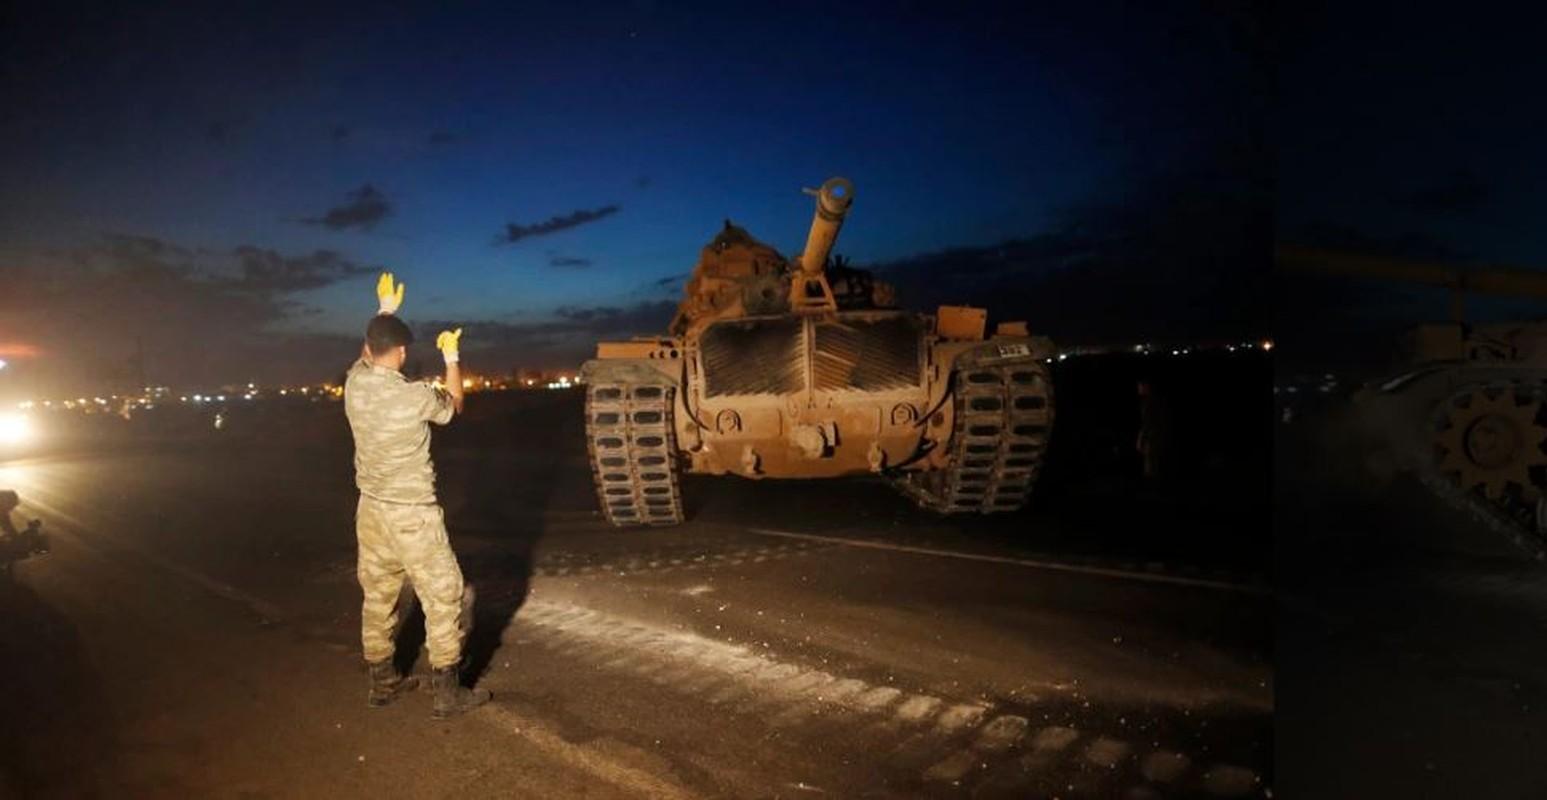 Canh tuong khoc liet khi biet kich Tho Nhi Ky tan cong nguoi Kurd-Hinh-10